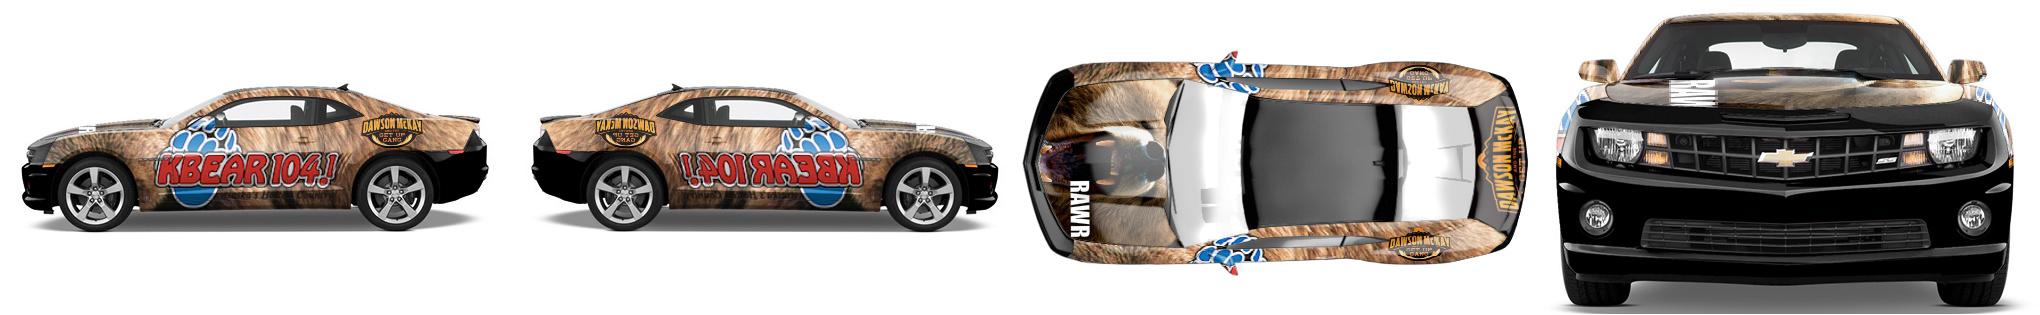 Muscle Car Wrap #917